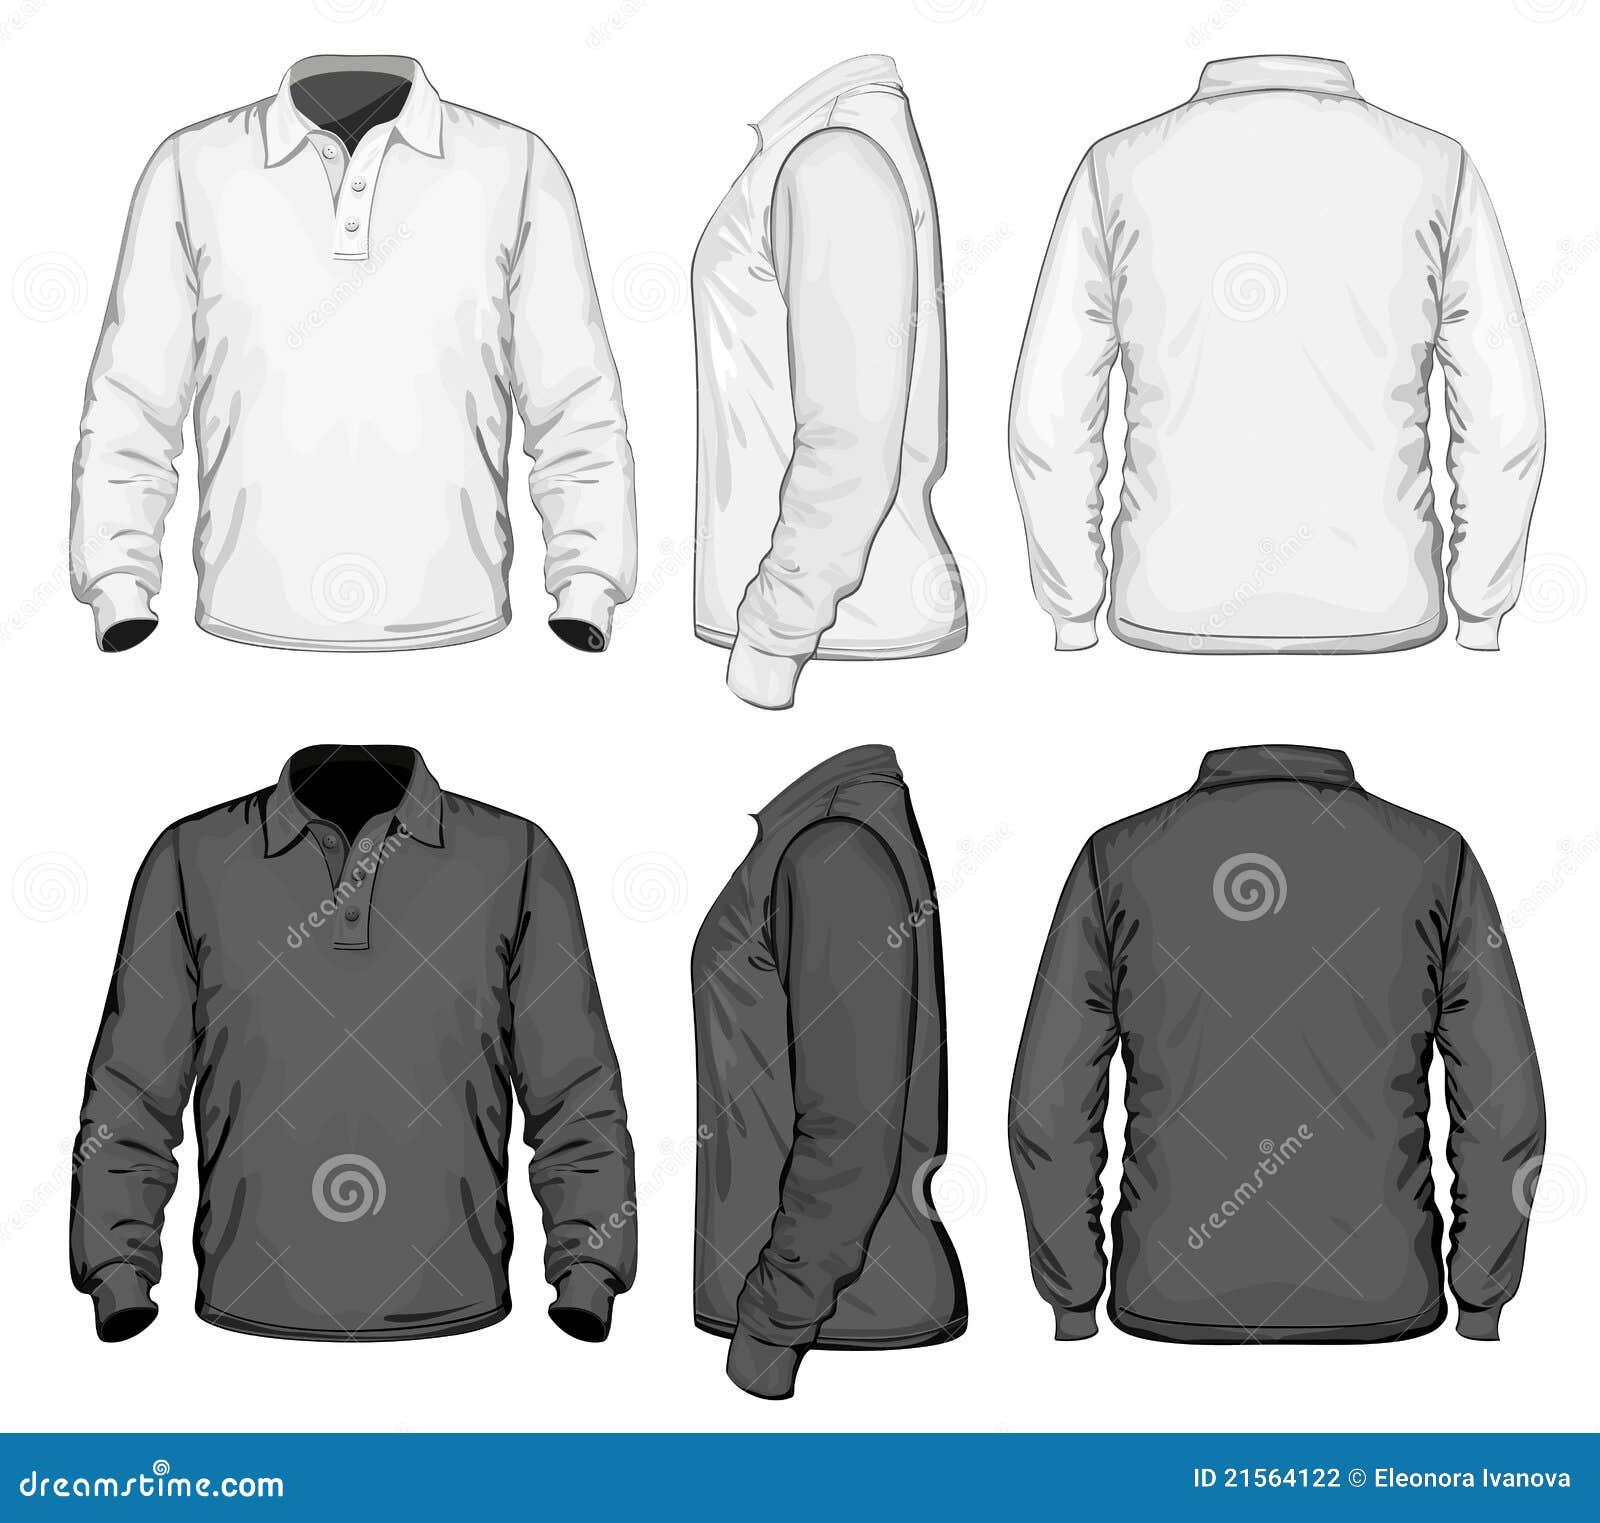 Shirt design on sleeve - Men S Polo Shirt Design Template Long Sleeve Stock Photography